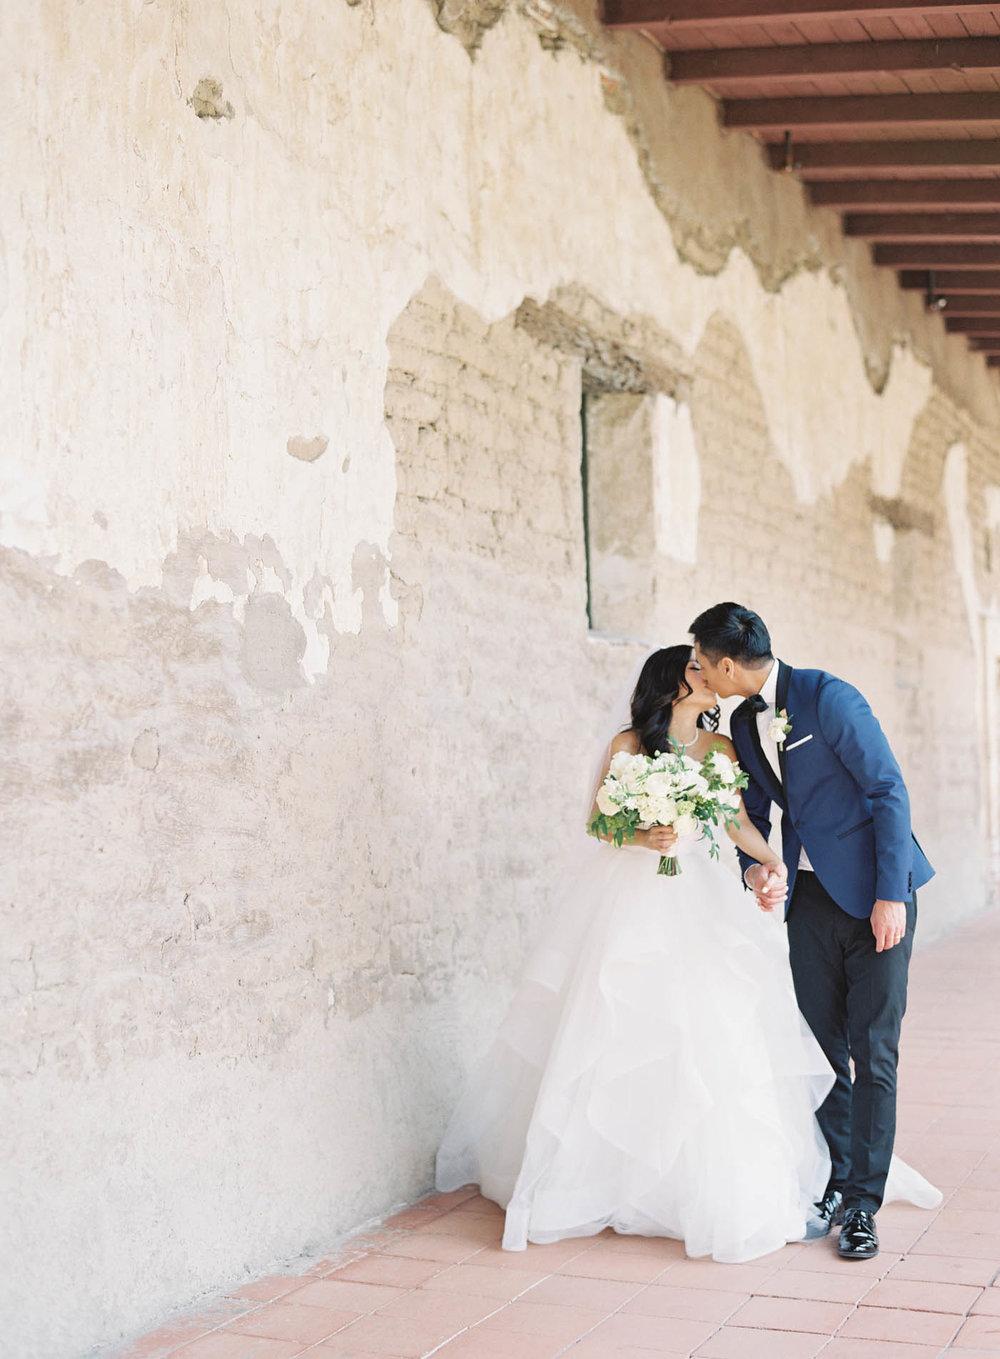 franciscan-gardens-wedding-5-Jen_Huang-000743-R1-016.jpg